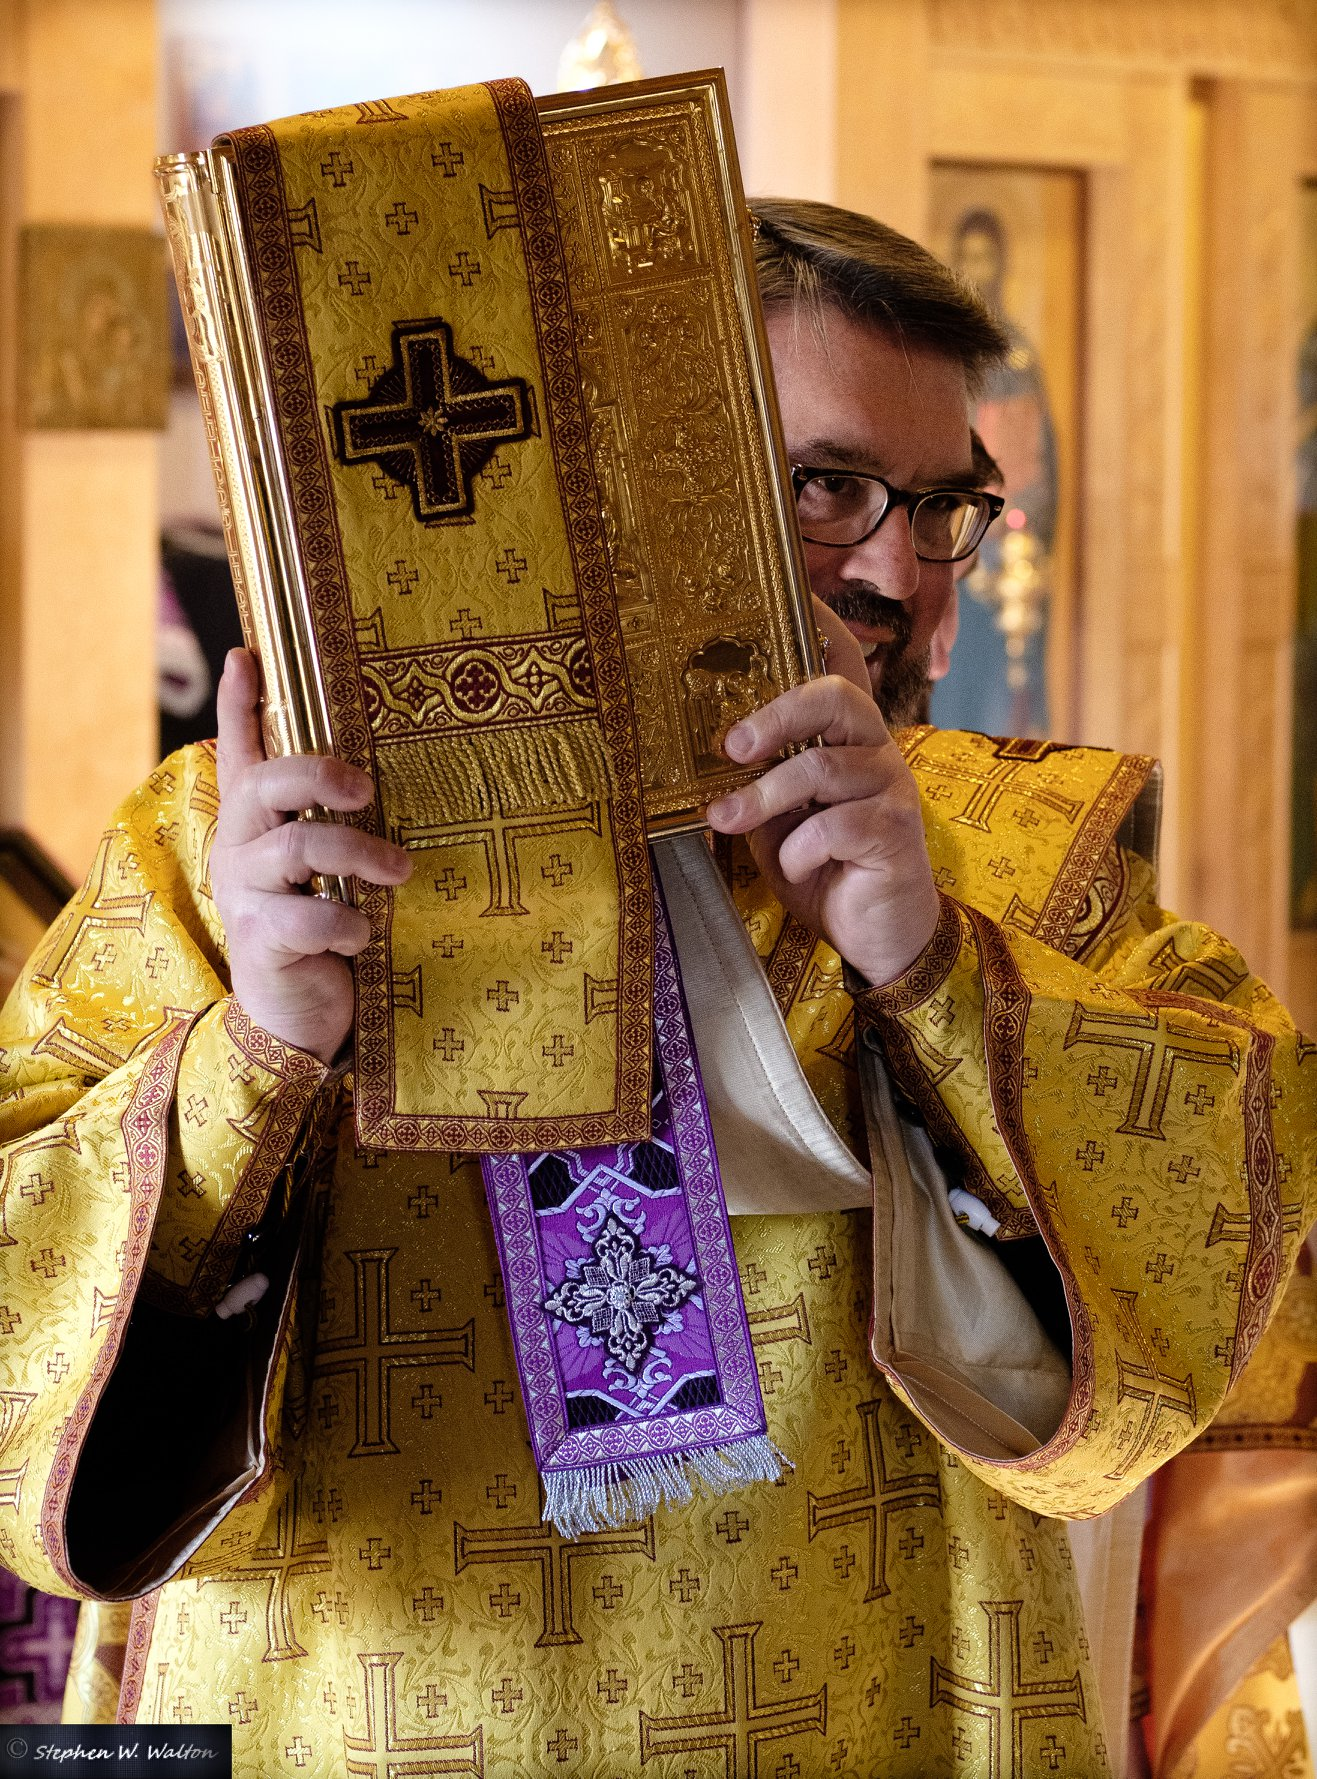 deacon carrying the gospel